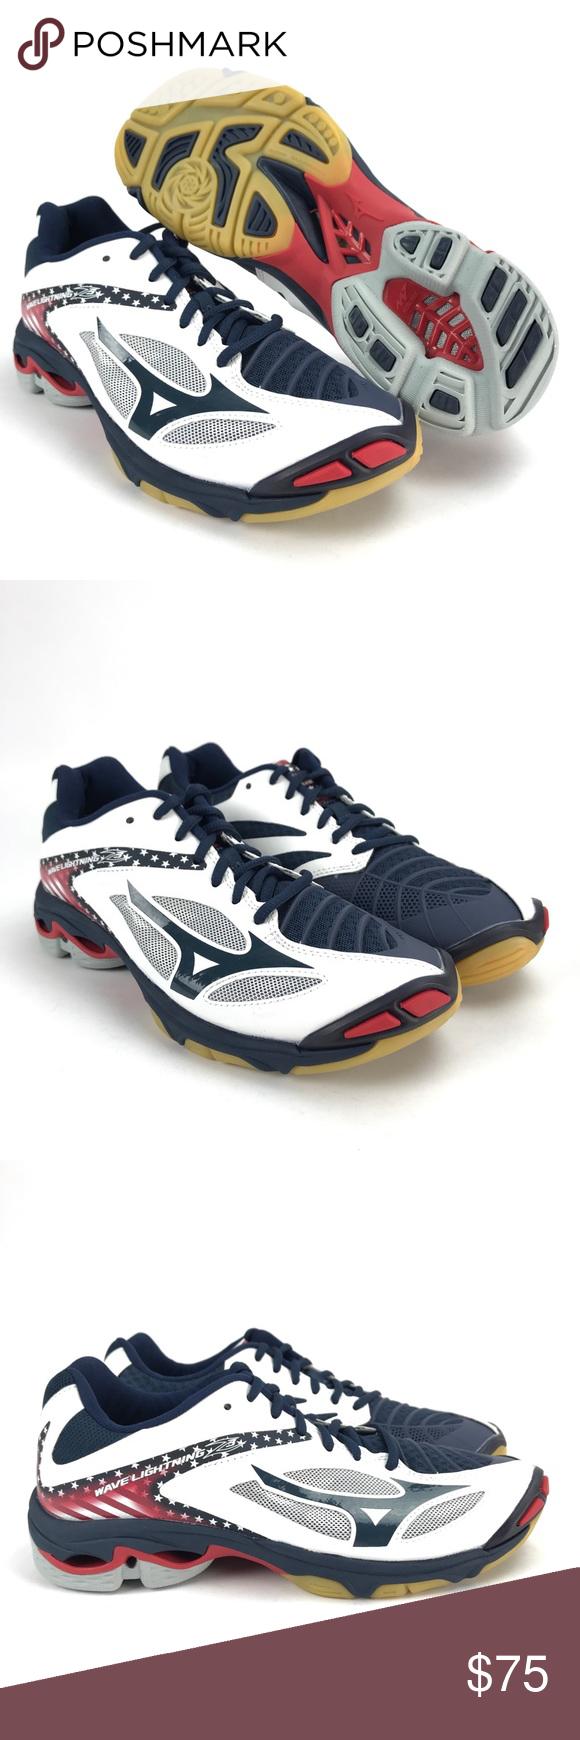 Mizuno Women S Wave Lightning Z3 Volleyball Shoes Nwt Volleyball Shoes Mizuno Shoes New Shoes